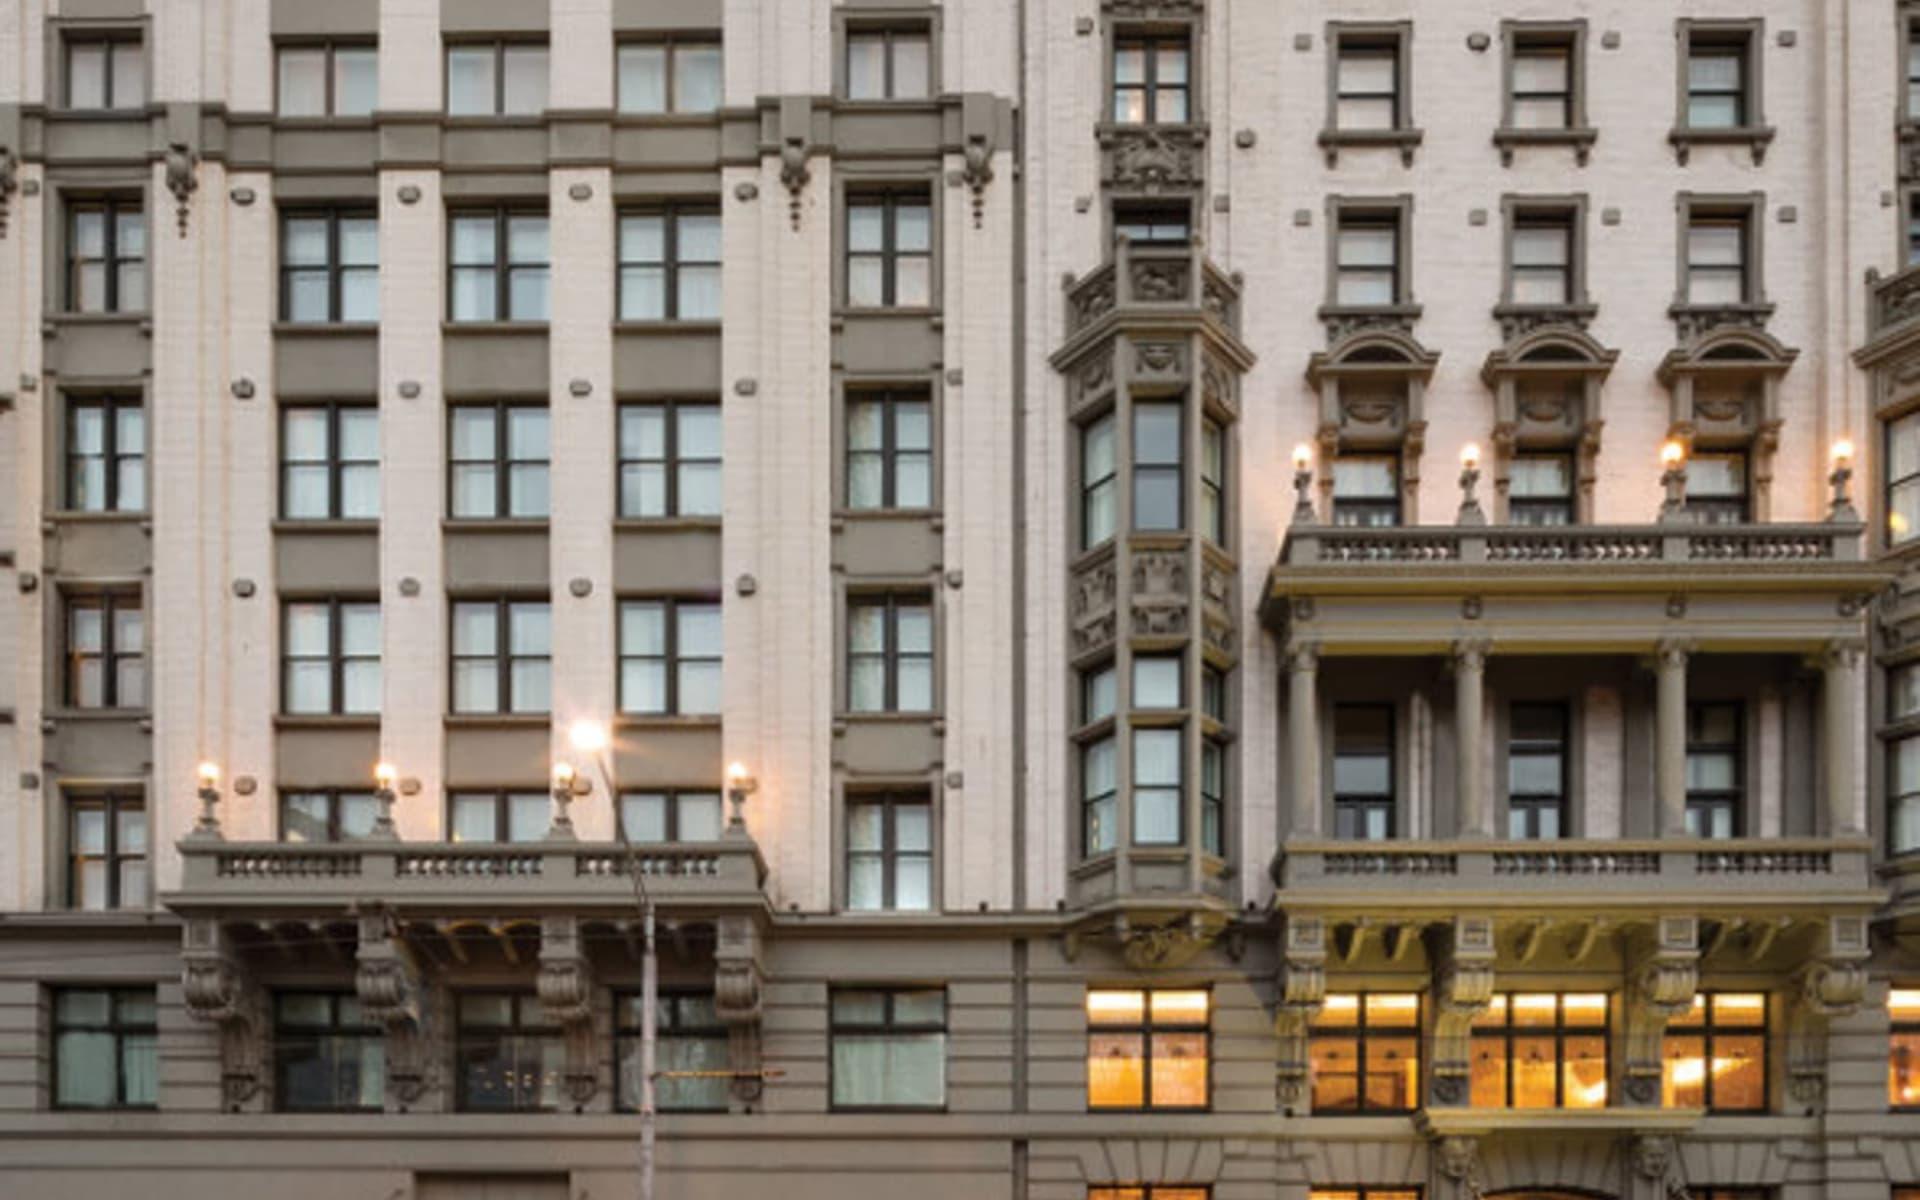 Rendezvous Hotel Melbourne: Rendezvous-hotel-melbourne-exterior-square